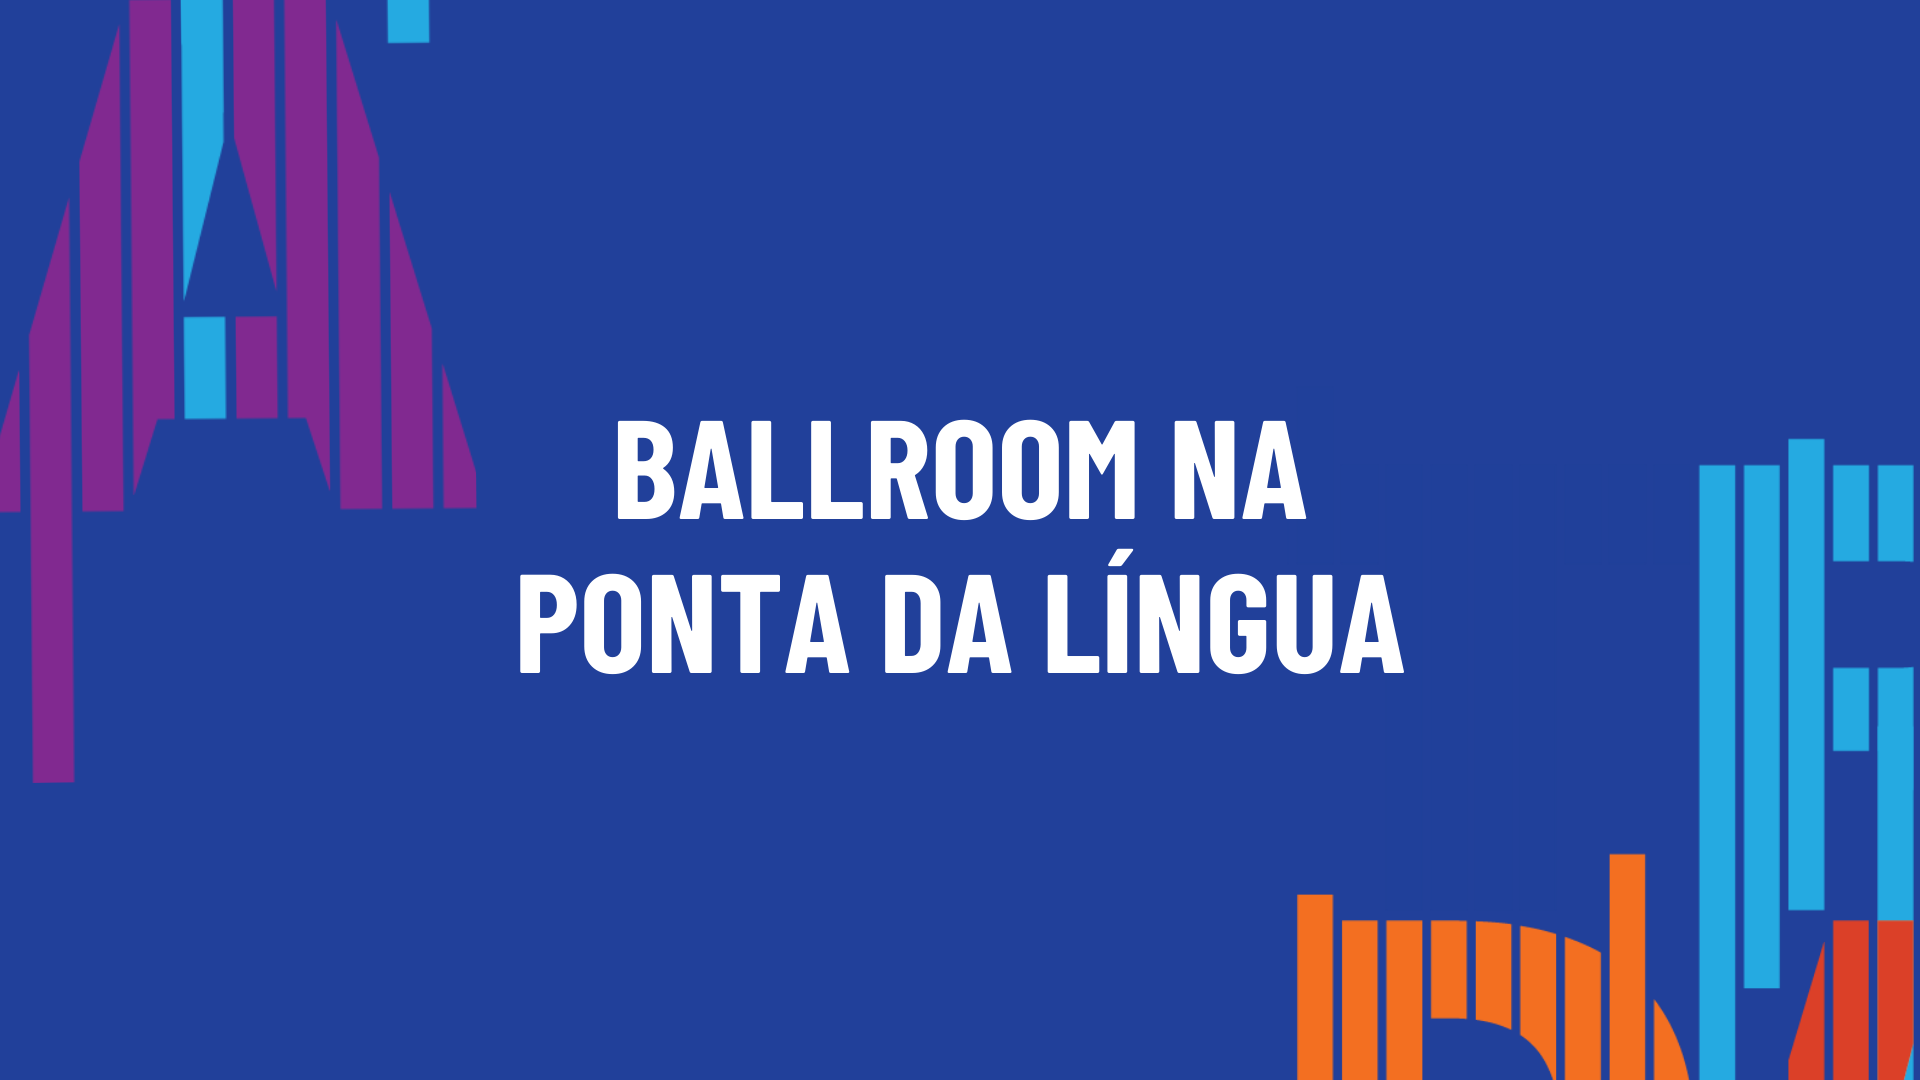 BALLROOM NA PONTA DA LÍNGUA